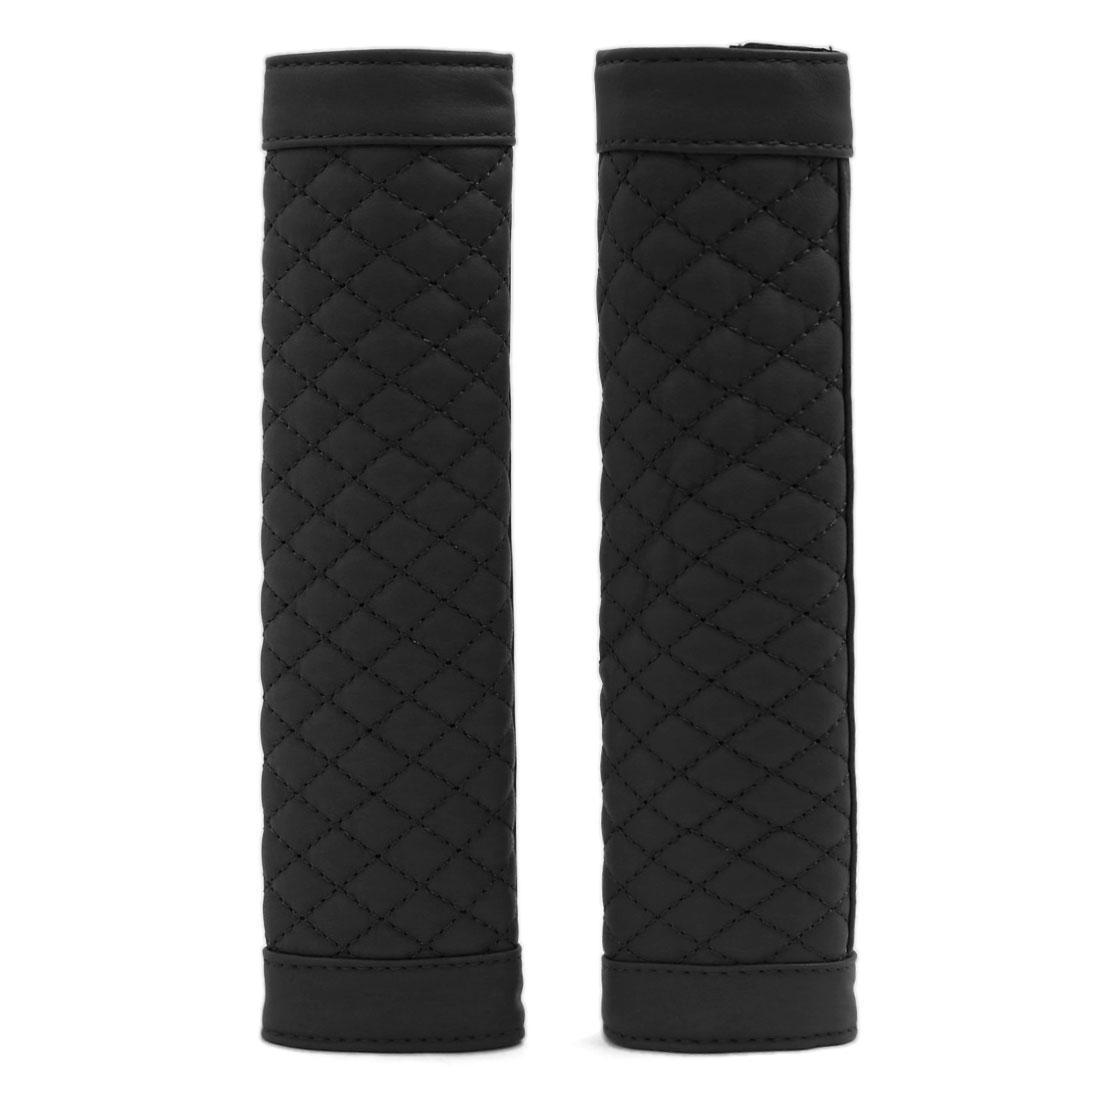 Pair Faux Leather Auto Car Safety Seat Belt Shoulder Pads Cover Cushion Black